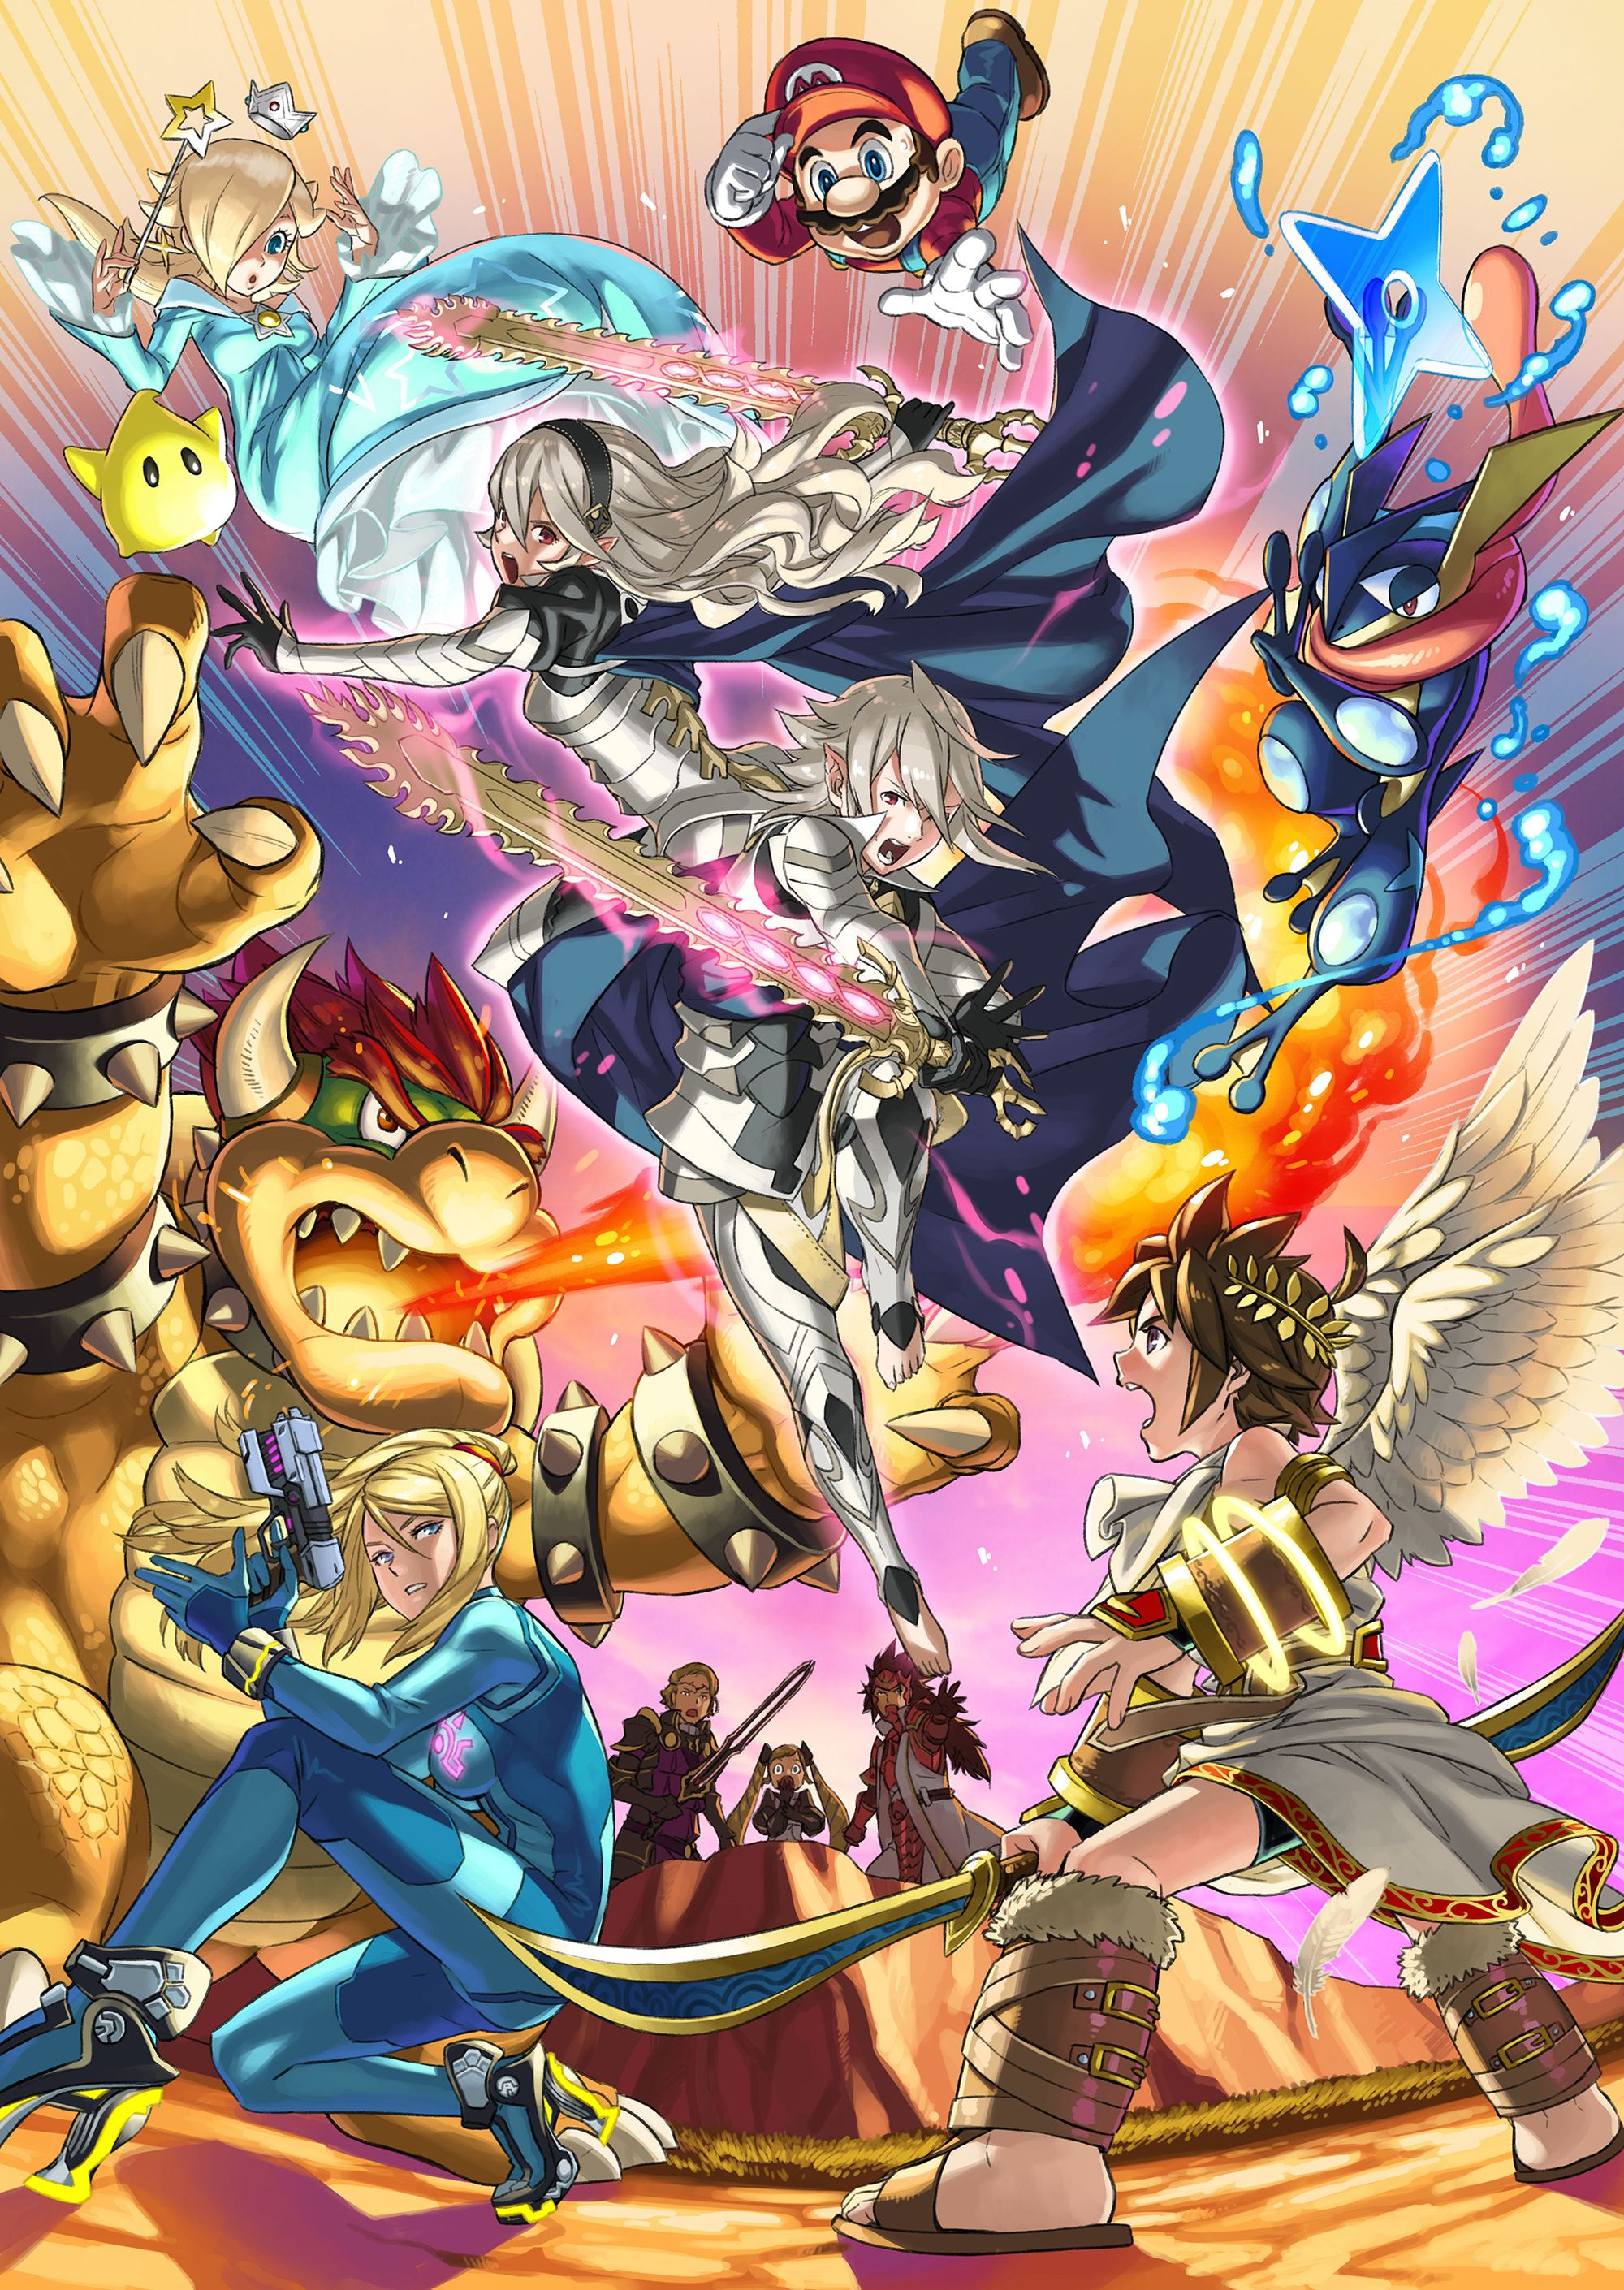 Wii U 3DS Fire Emblem Fates Pokemon Metroid Kid Icarus